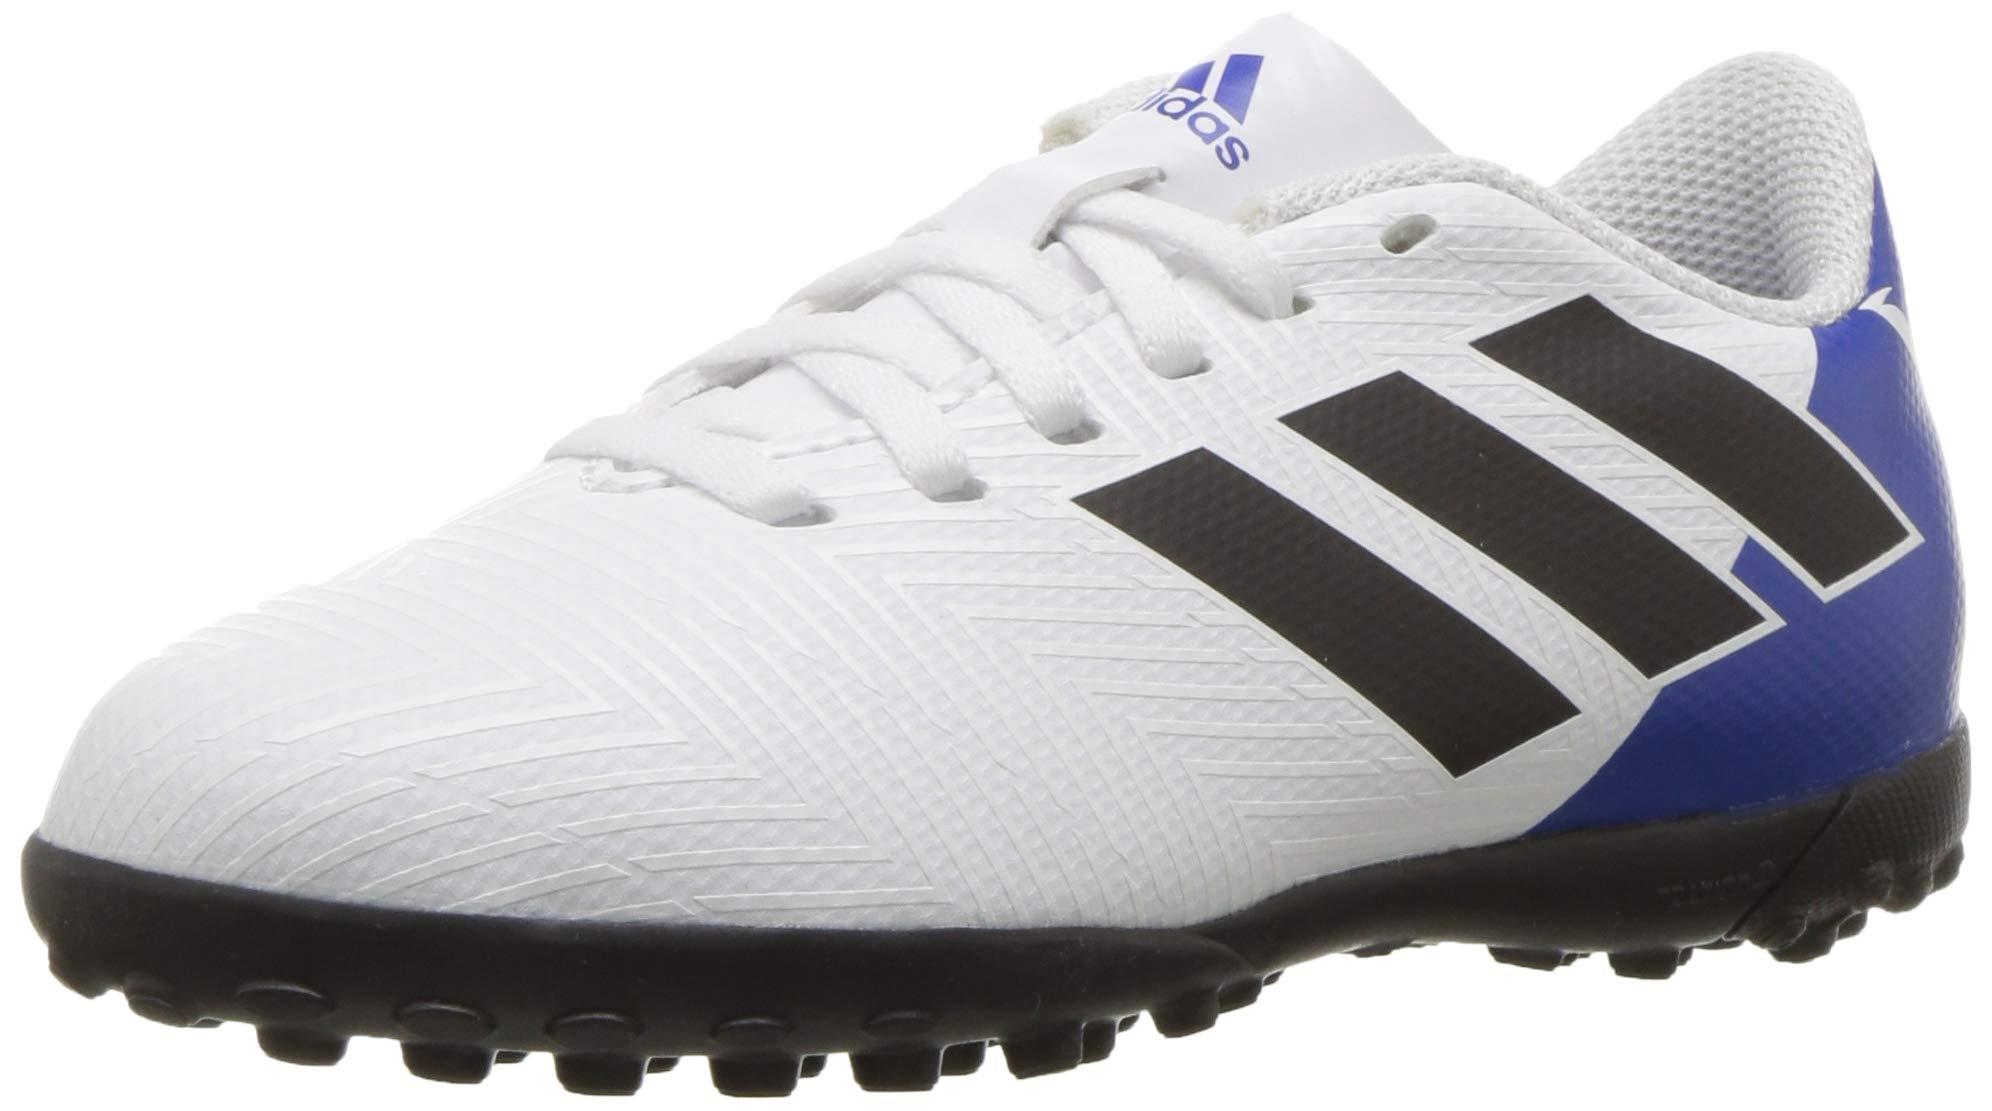 40e37b9e7f Galleon - Adidas Unisex Nemeziz Messi Tango 18.4 Turf Soccer Shoe ...